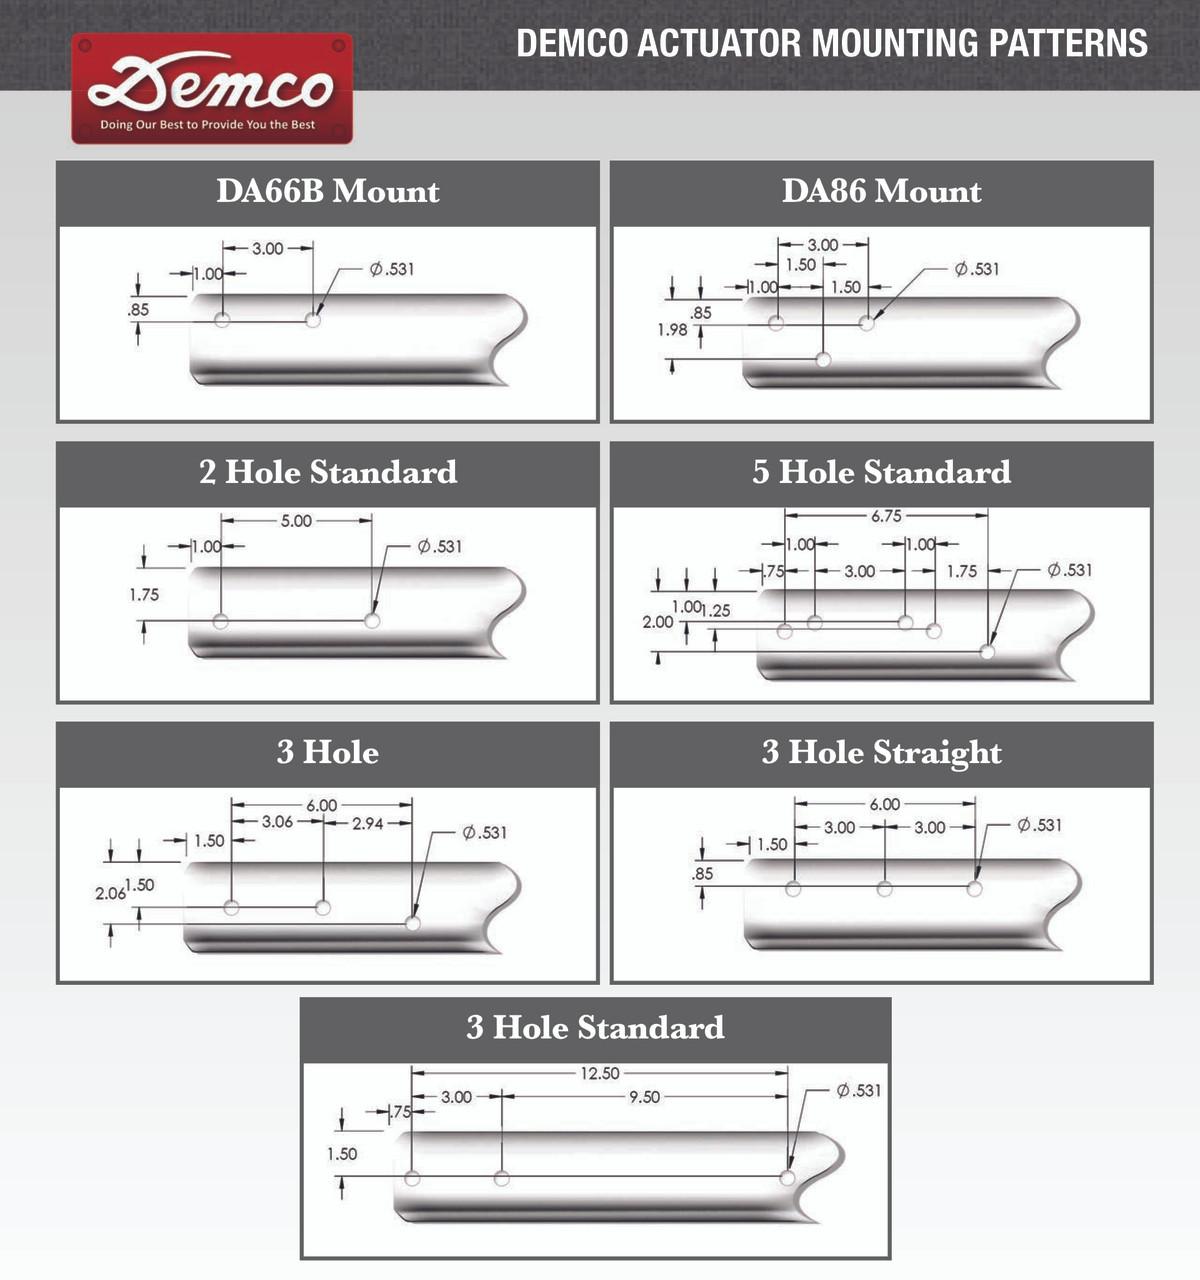 8101031 --- Demco Hydraulic Brake Actuator with Channel Down - 12,500 lb Capacity - Model DA10